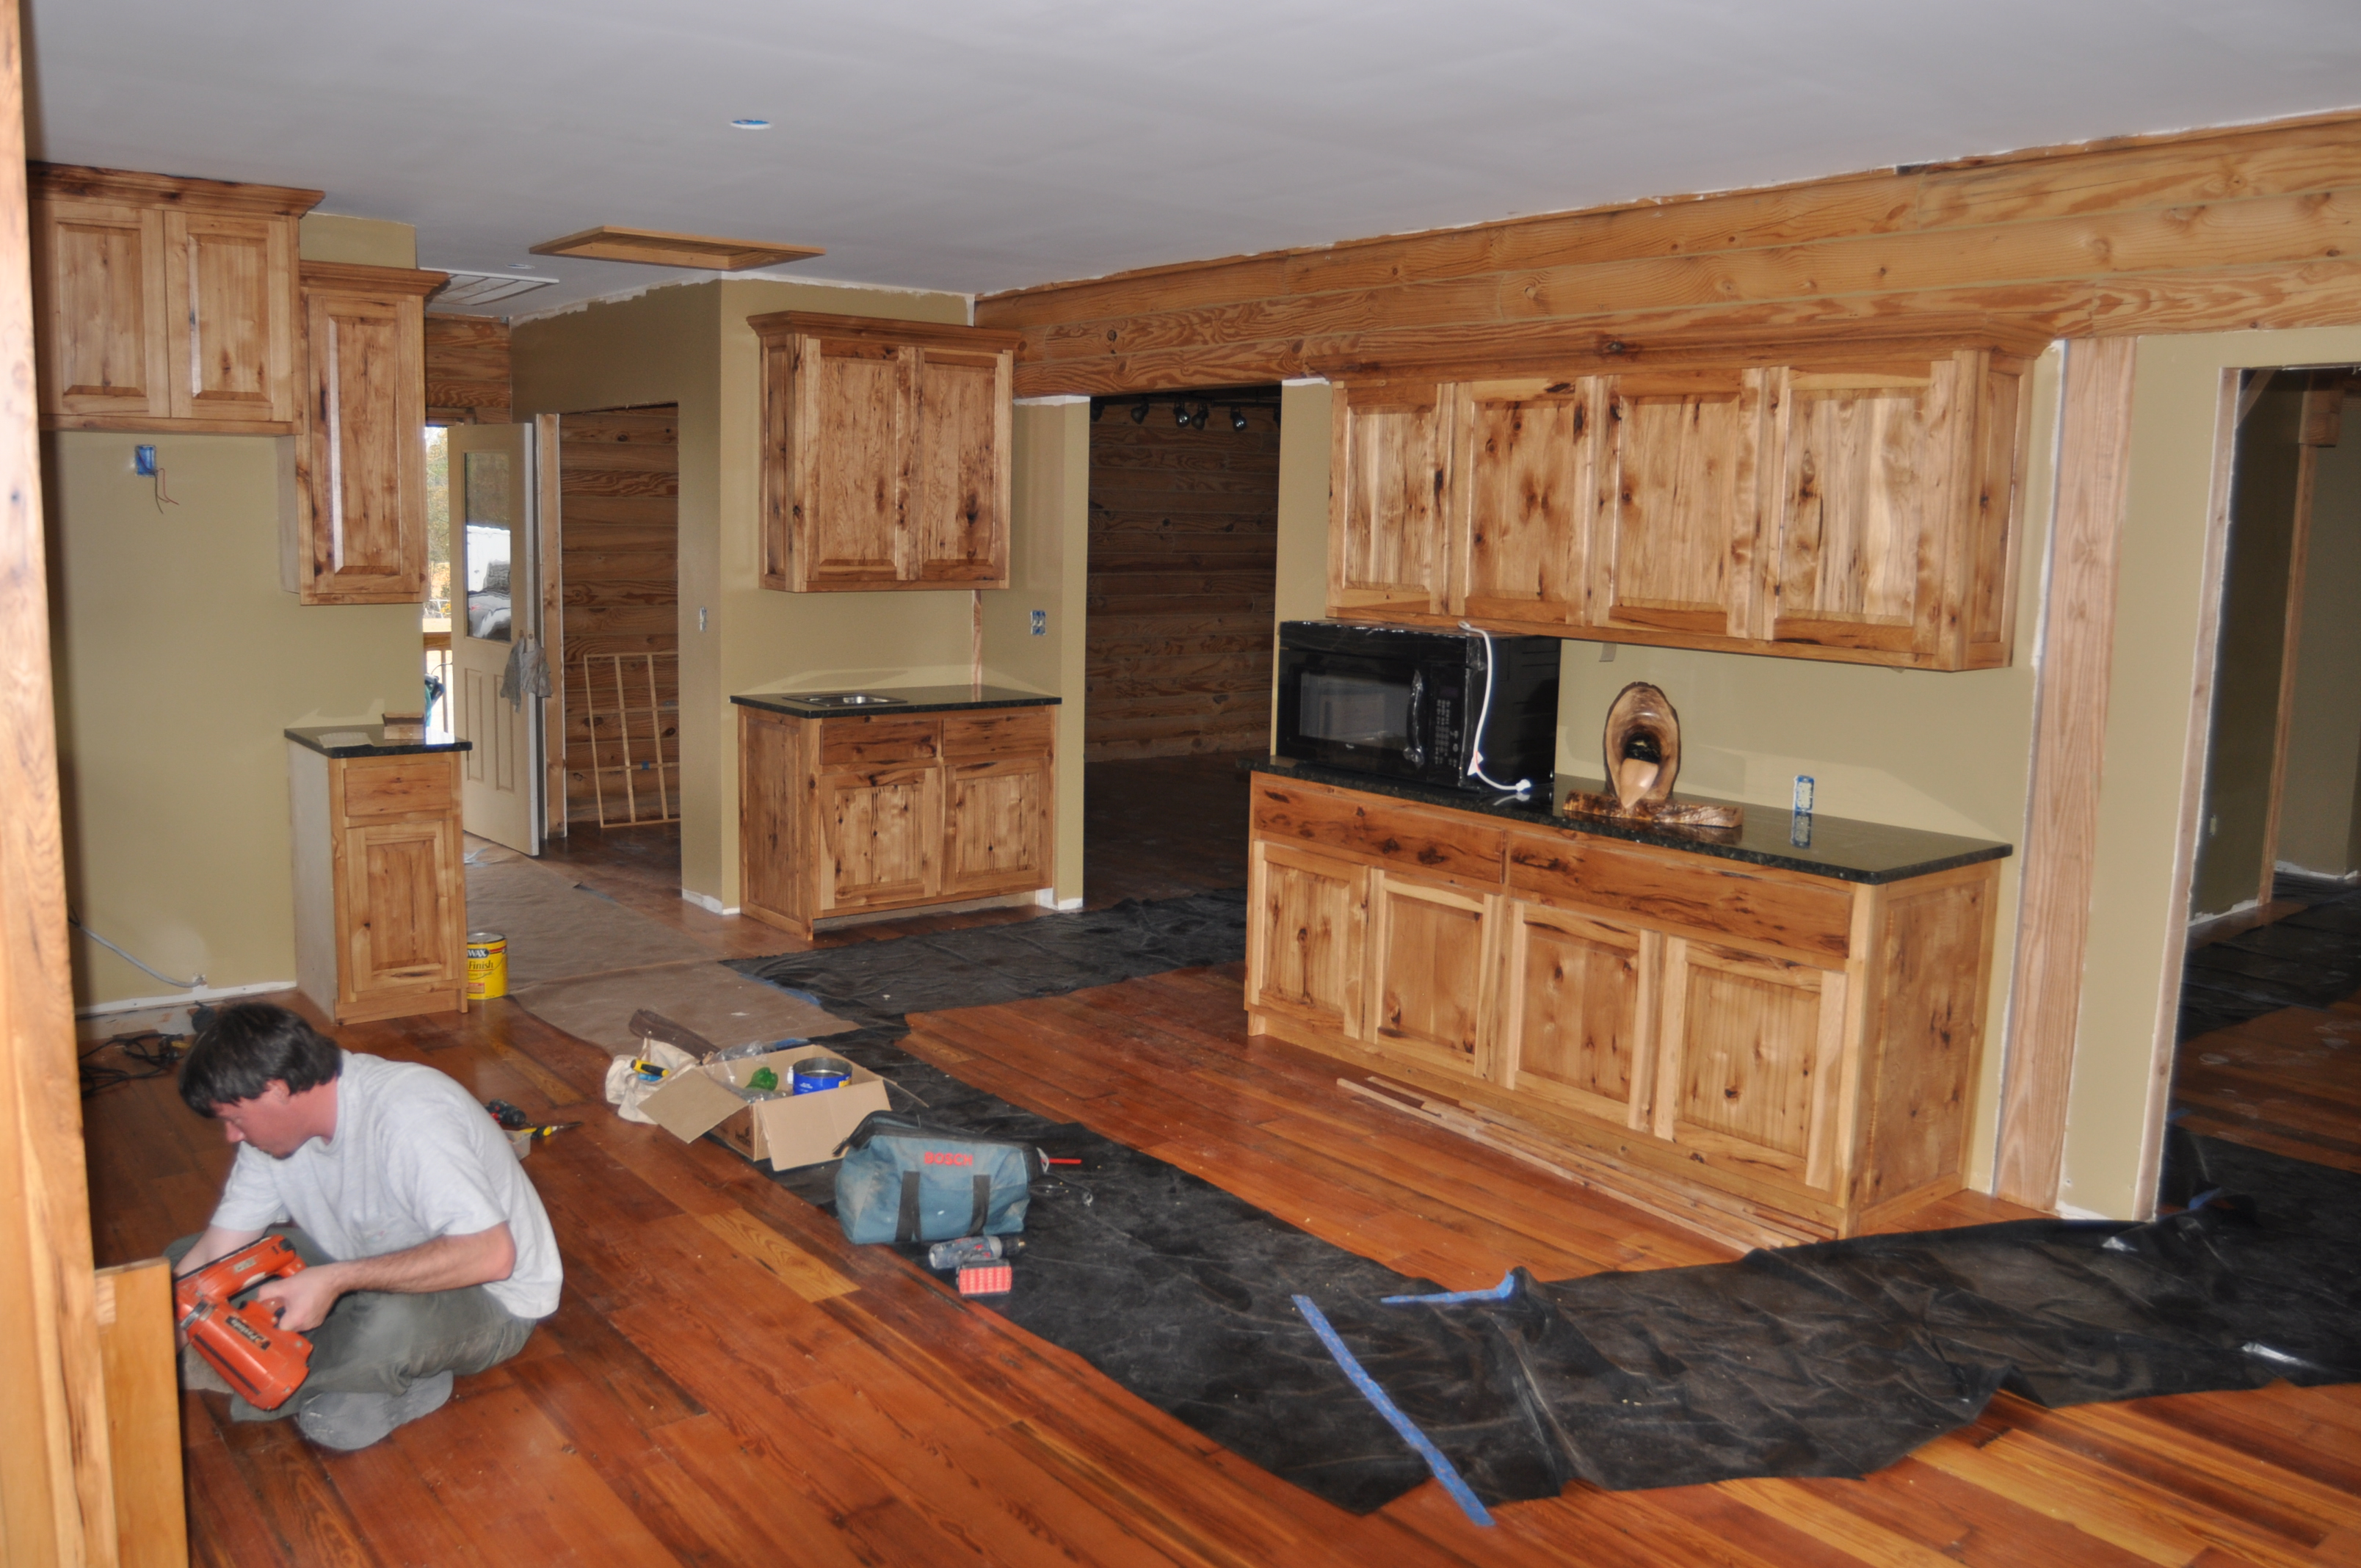 Hickory cabinets (knotty)